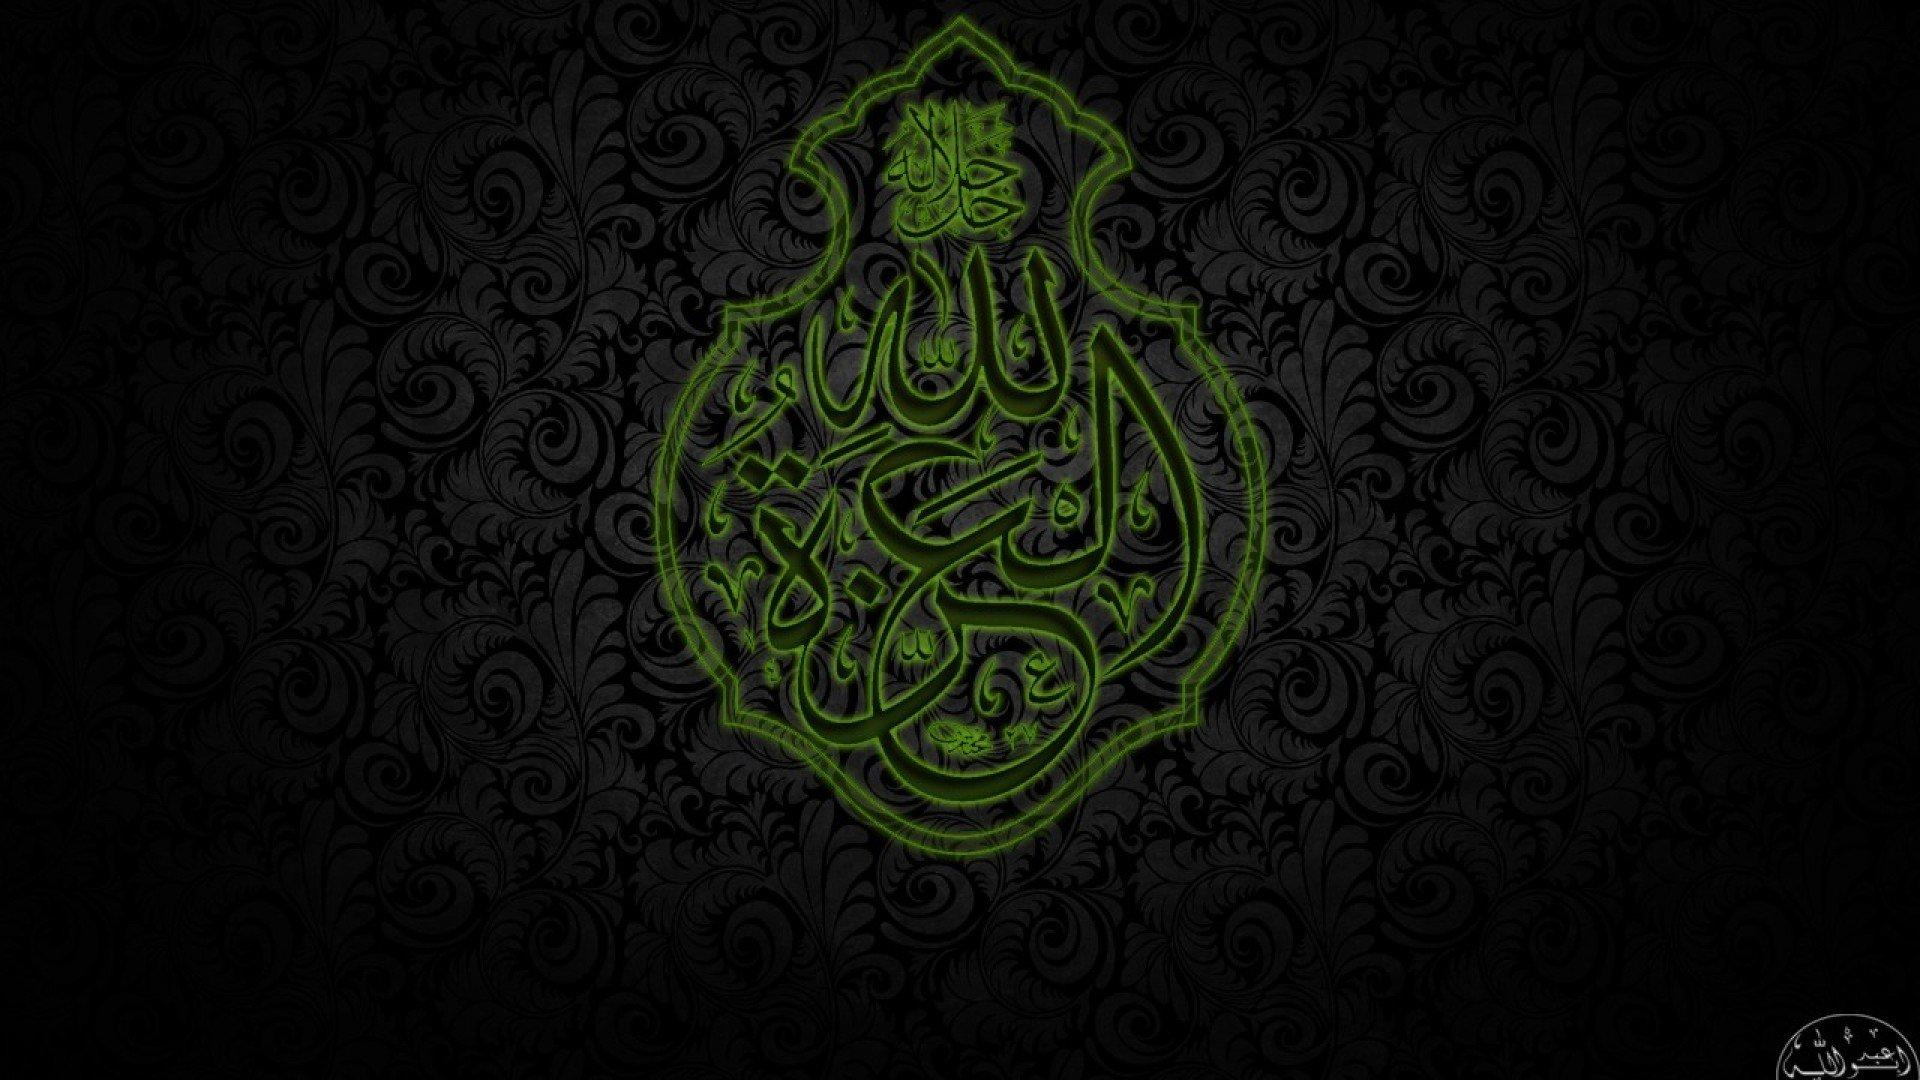 Fond D Ecran 1920x1080 Px Islam Musulman Religion 1920x1080 Goodfon 1574865 Fond D Ecran Wallhere